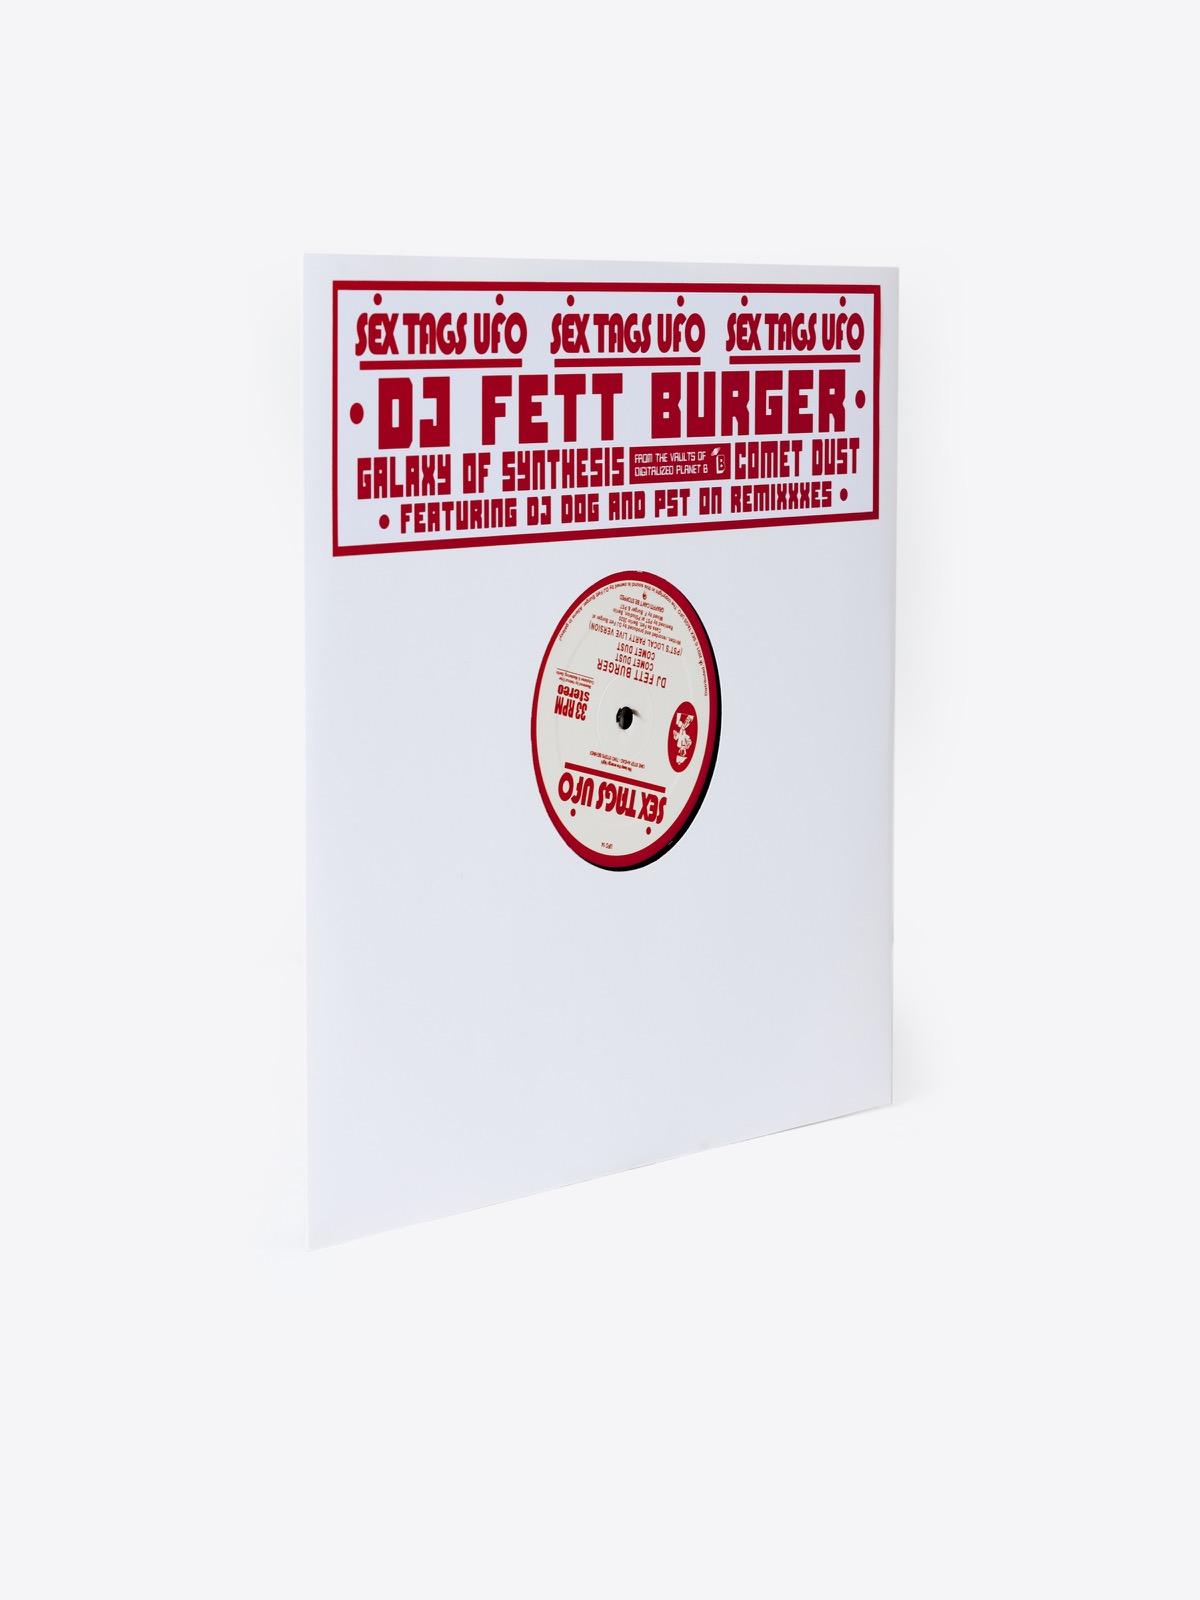 - DJ Fett Burger - Galaxy Of Synthesis /Comet Dust